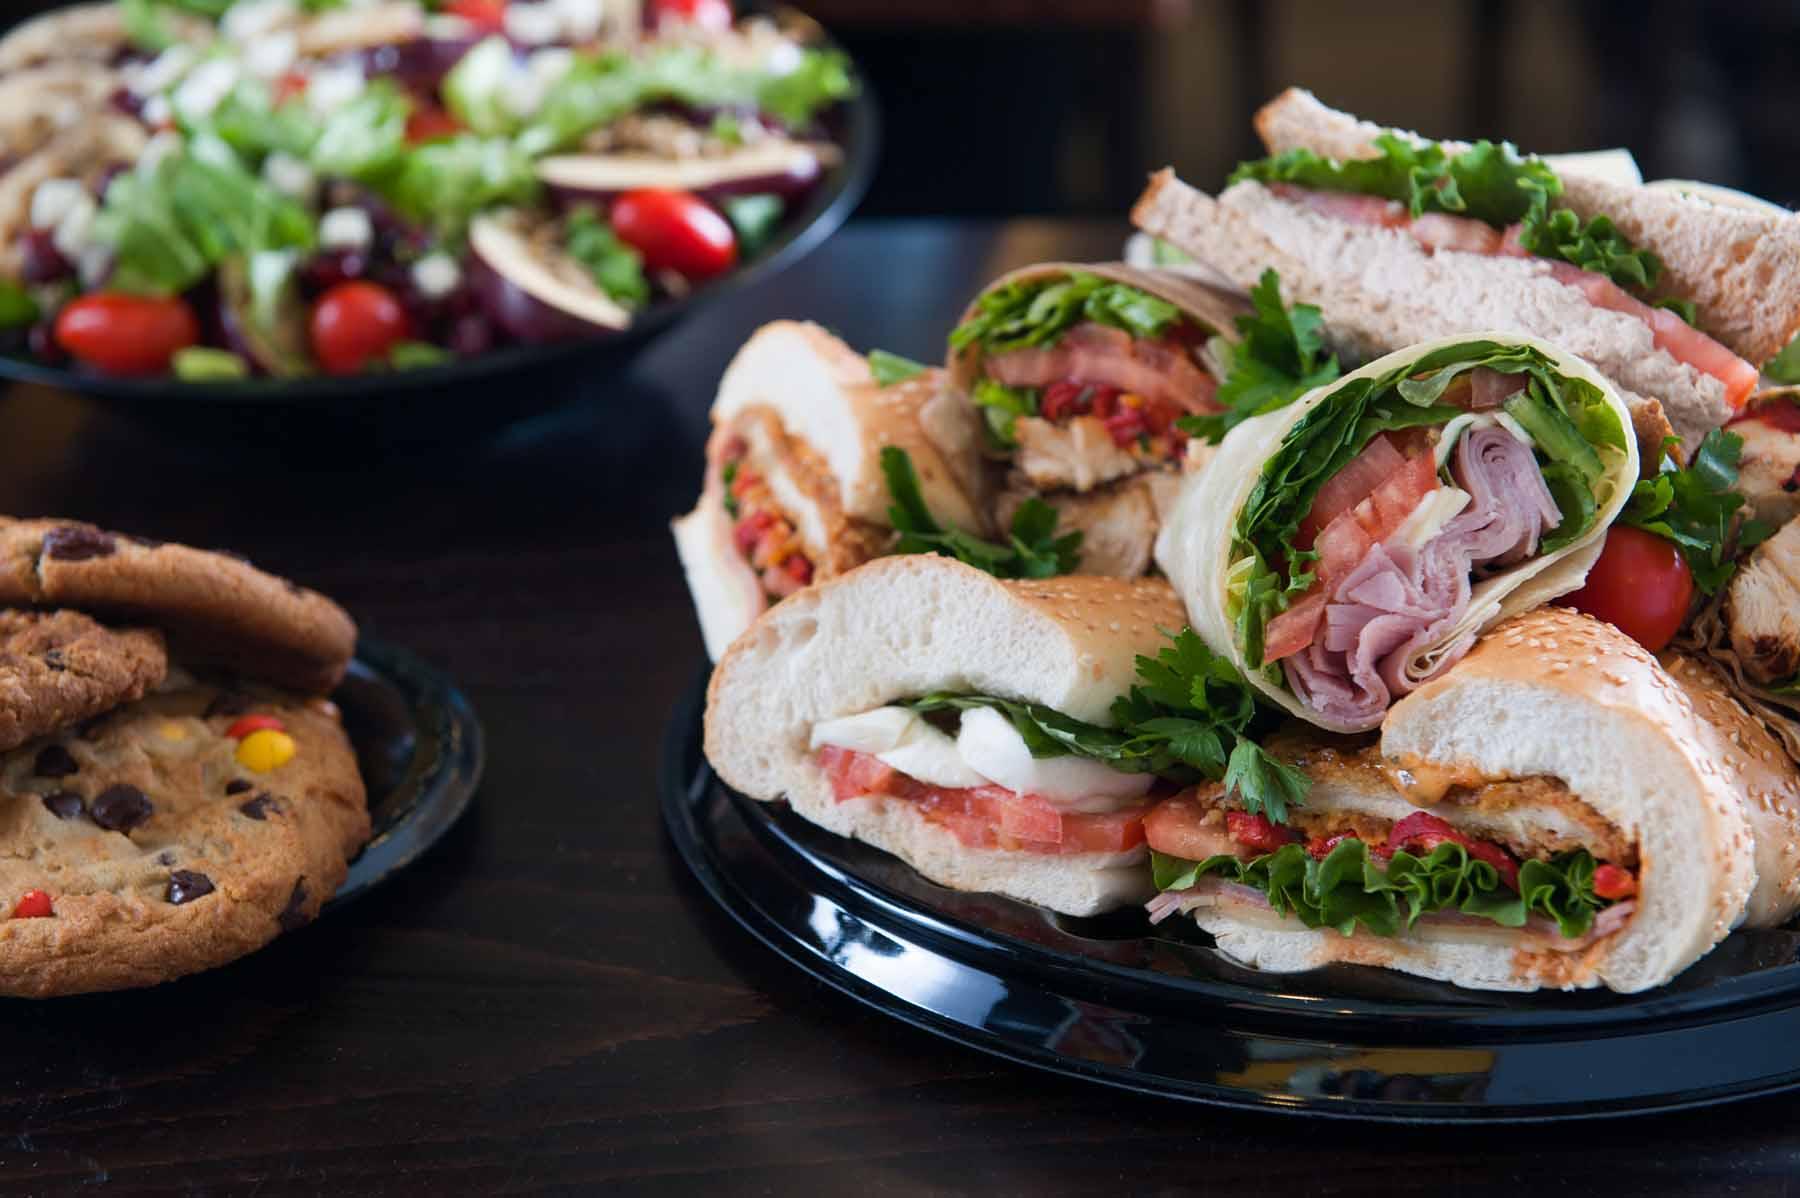 Sandwich Tray